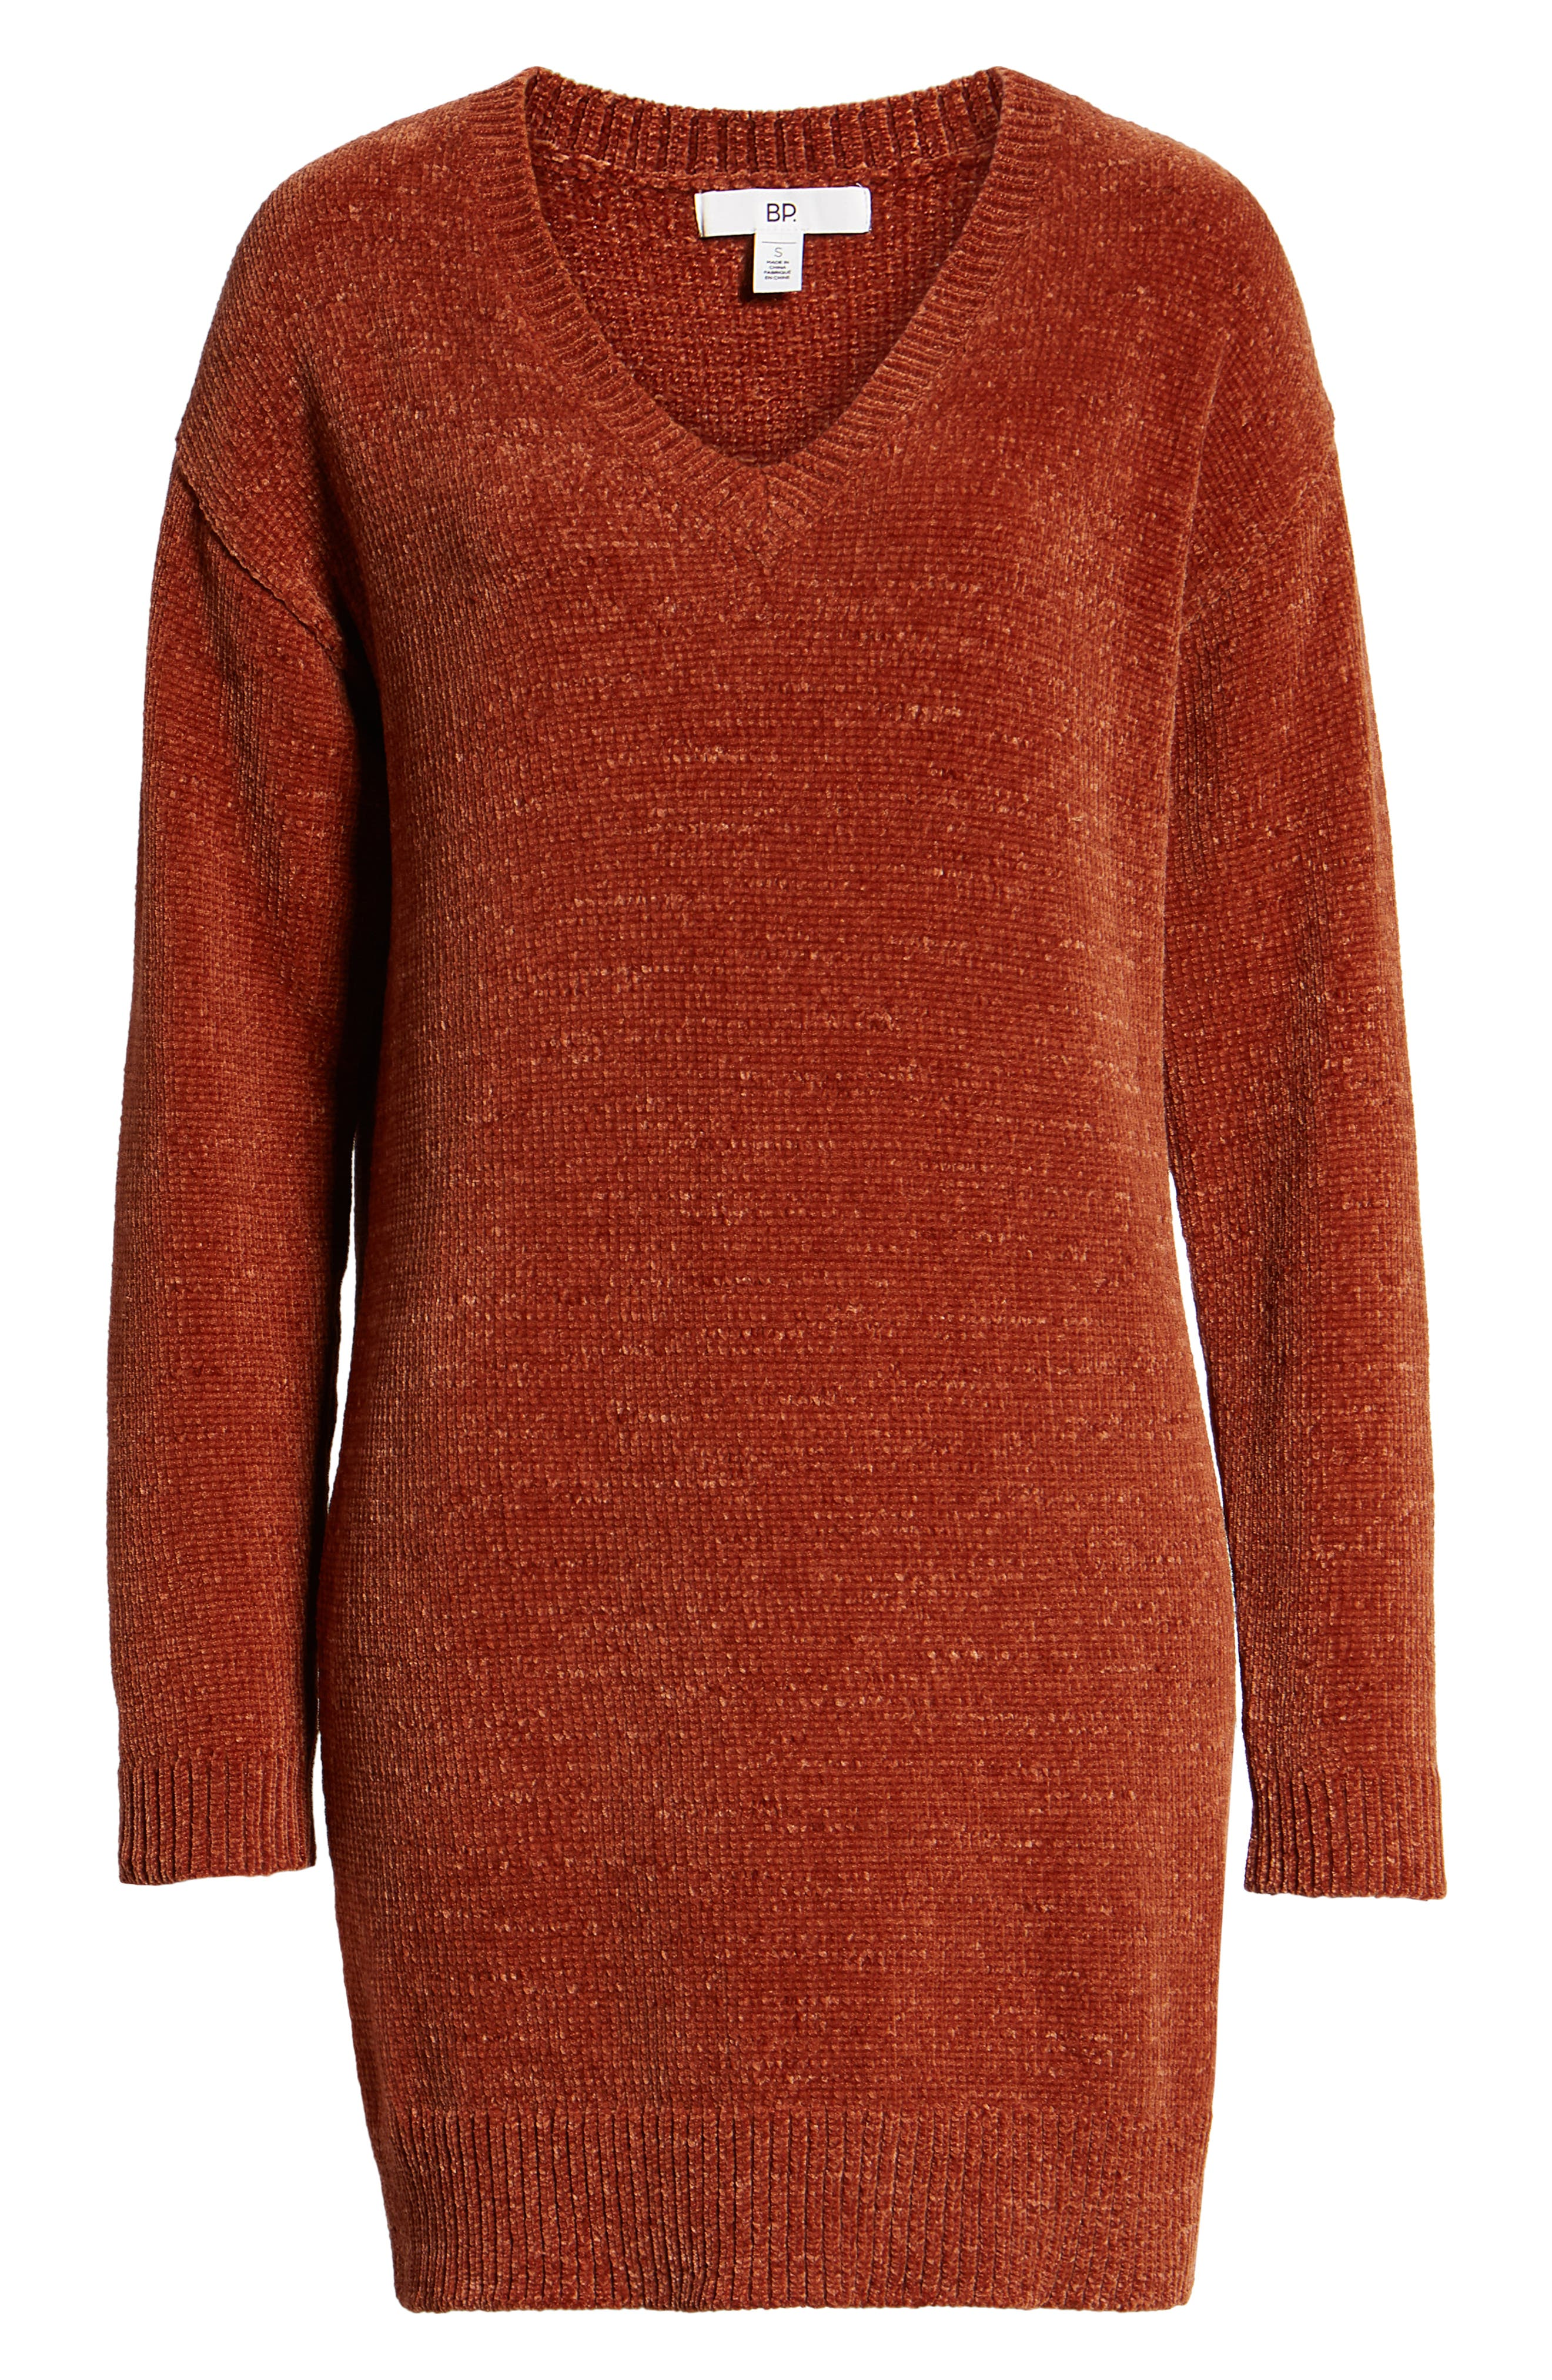 Chenille Sweater Dress,                             Alternate thumbnail 7, color,                             221